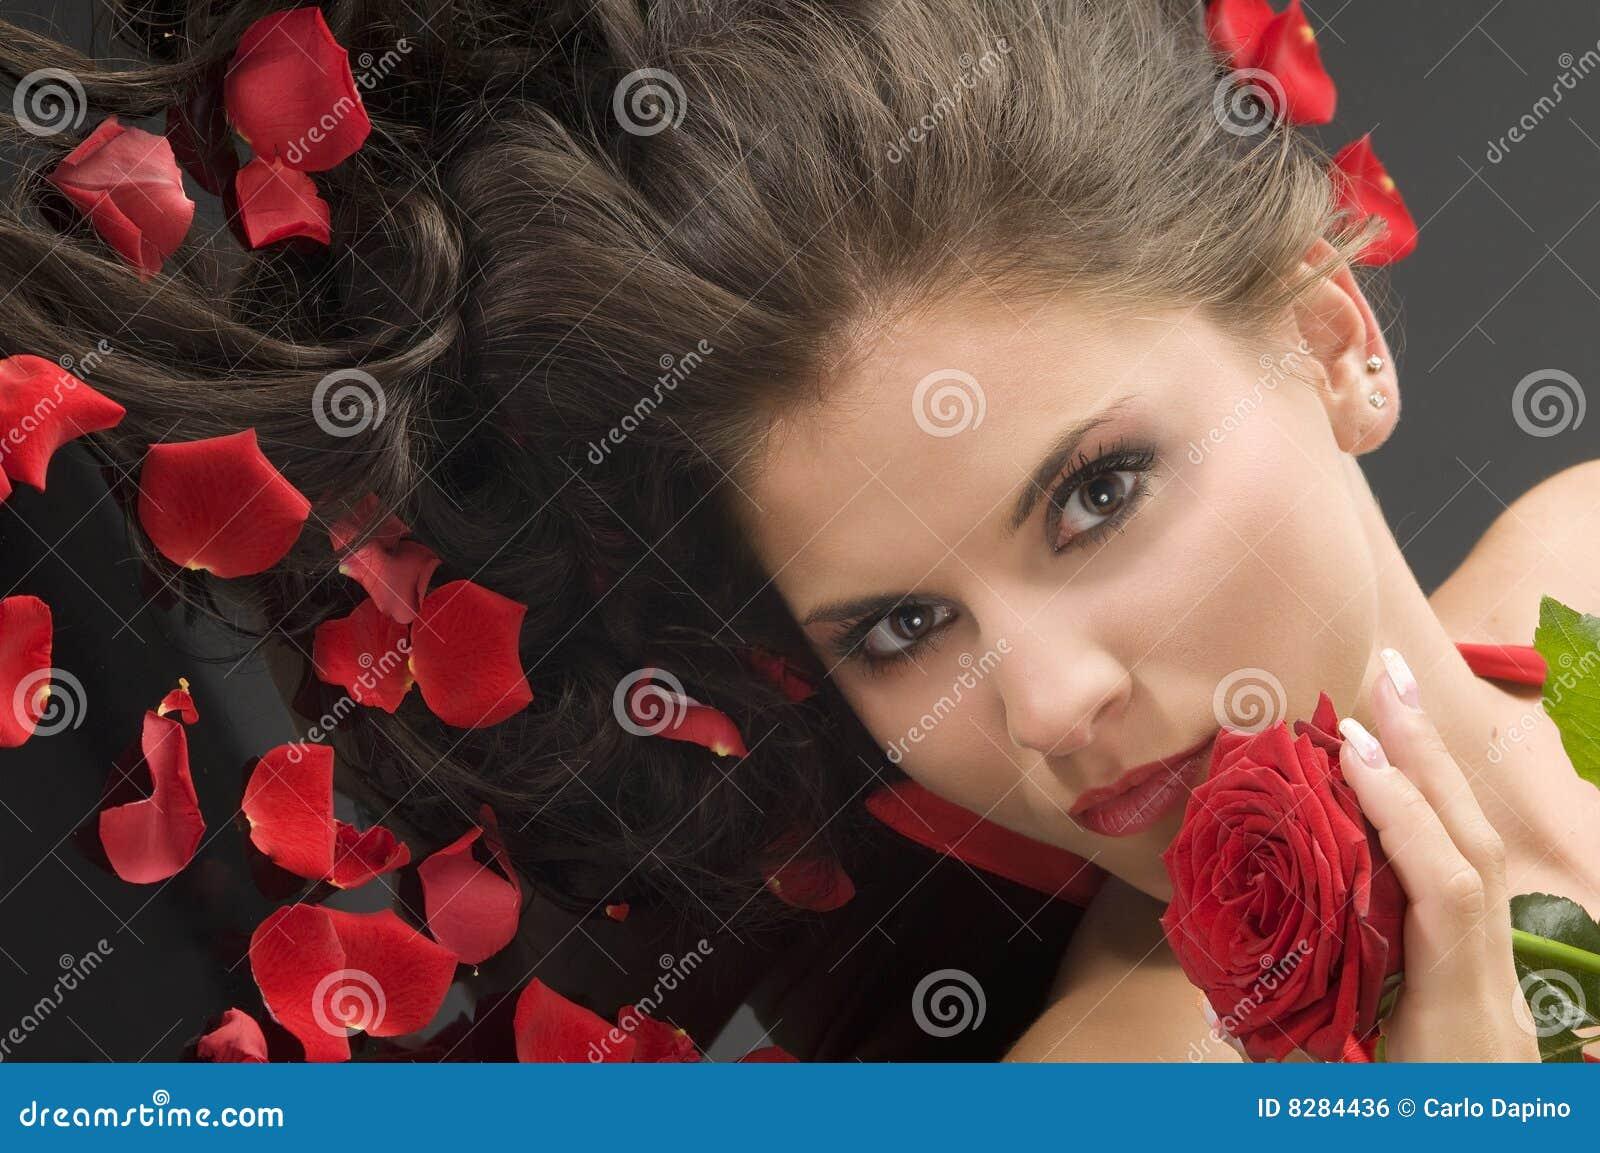 Rose and petals